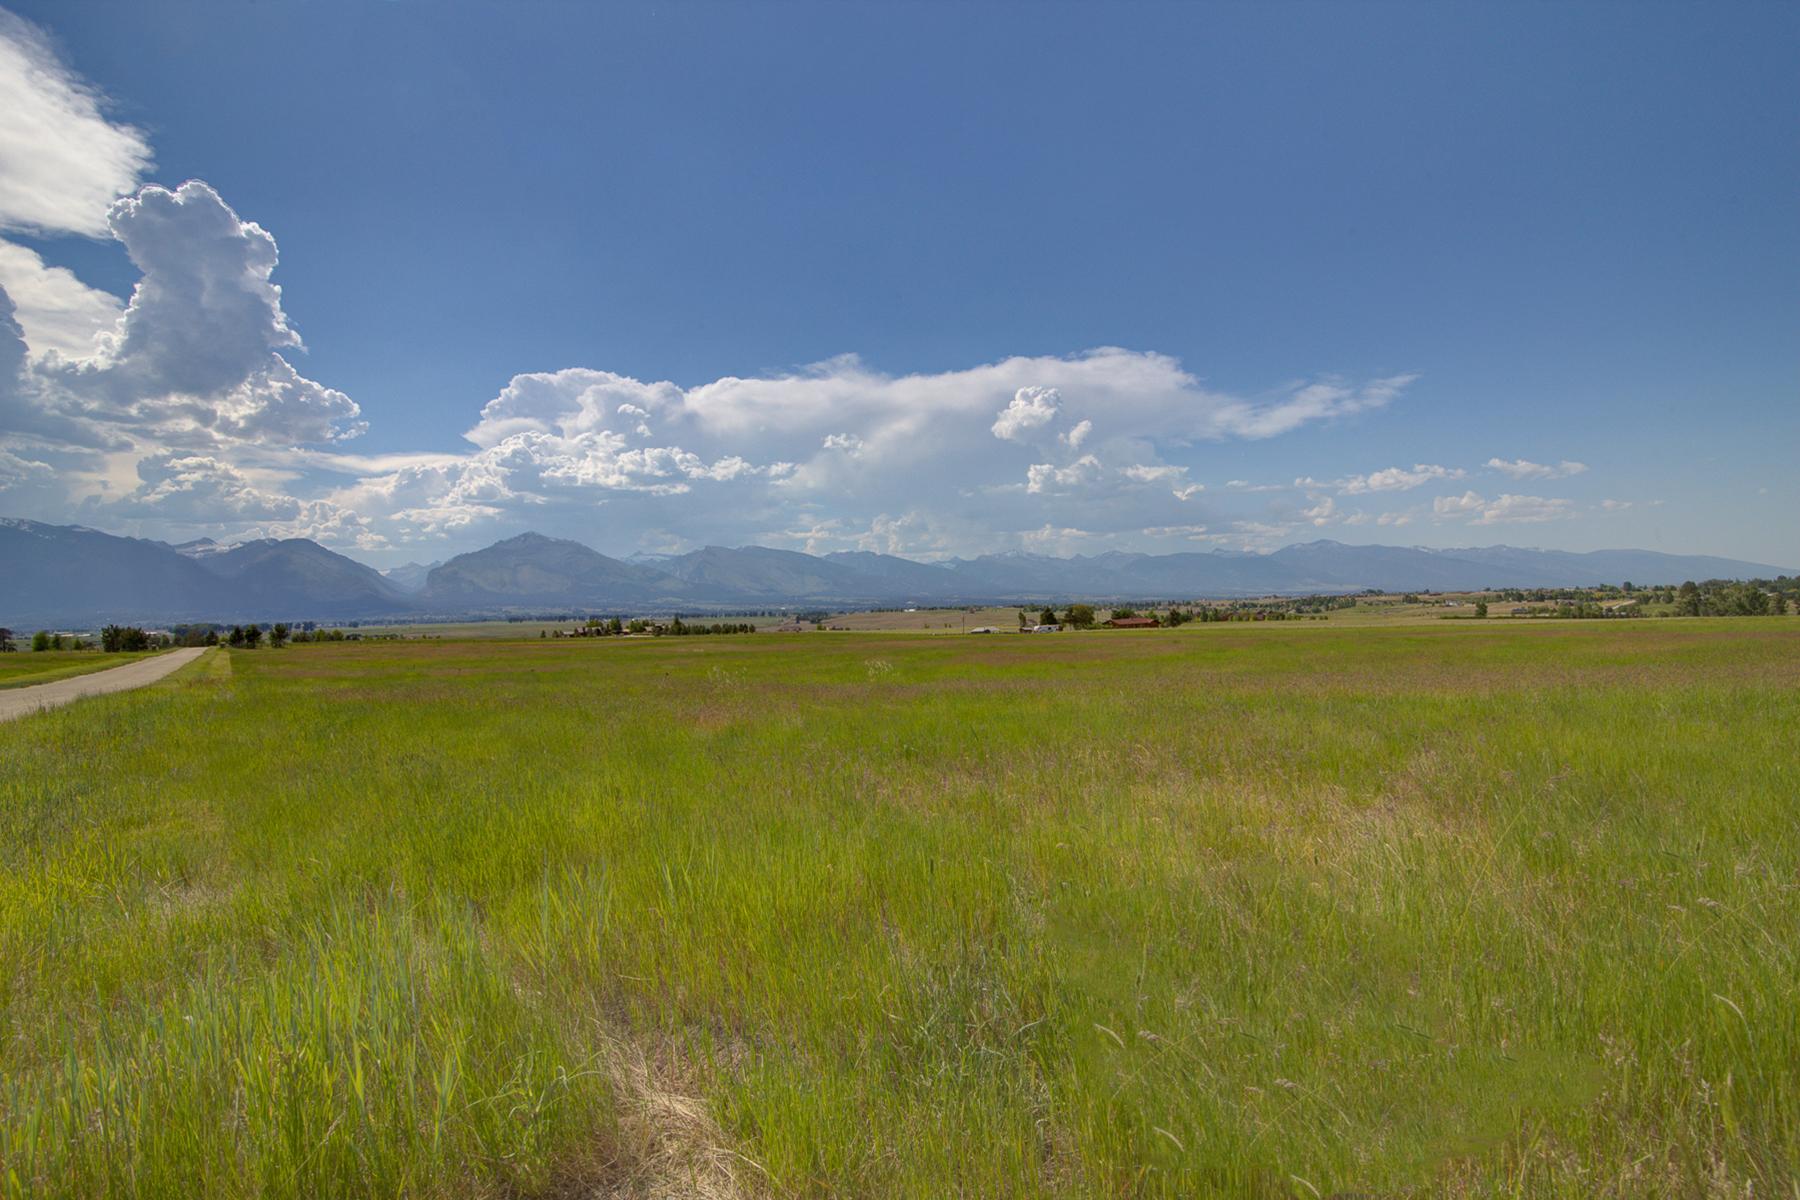 Land for Sale at Lot 7B Palfiena Trail, Hamilton, MT 59840 Lot 7b Palfiena Trl Hamilton, Montana, 59840 United States